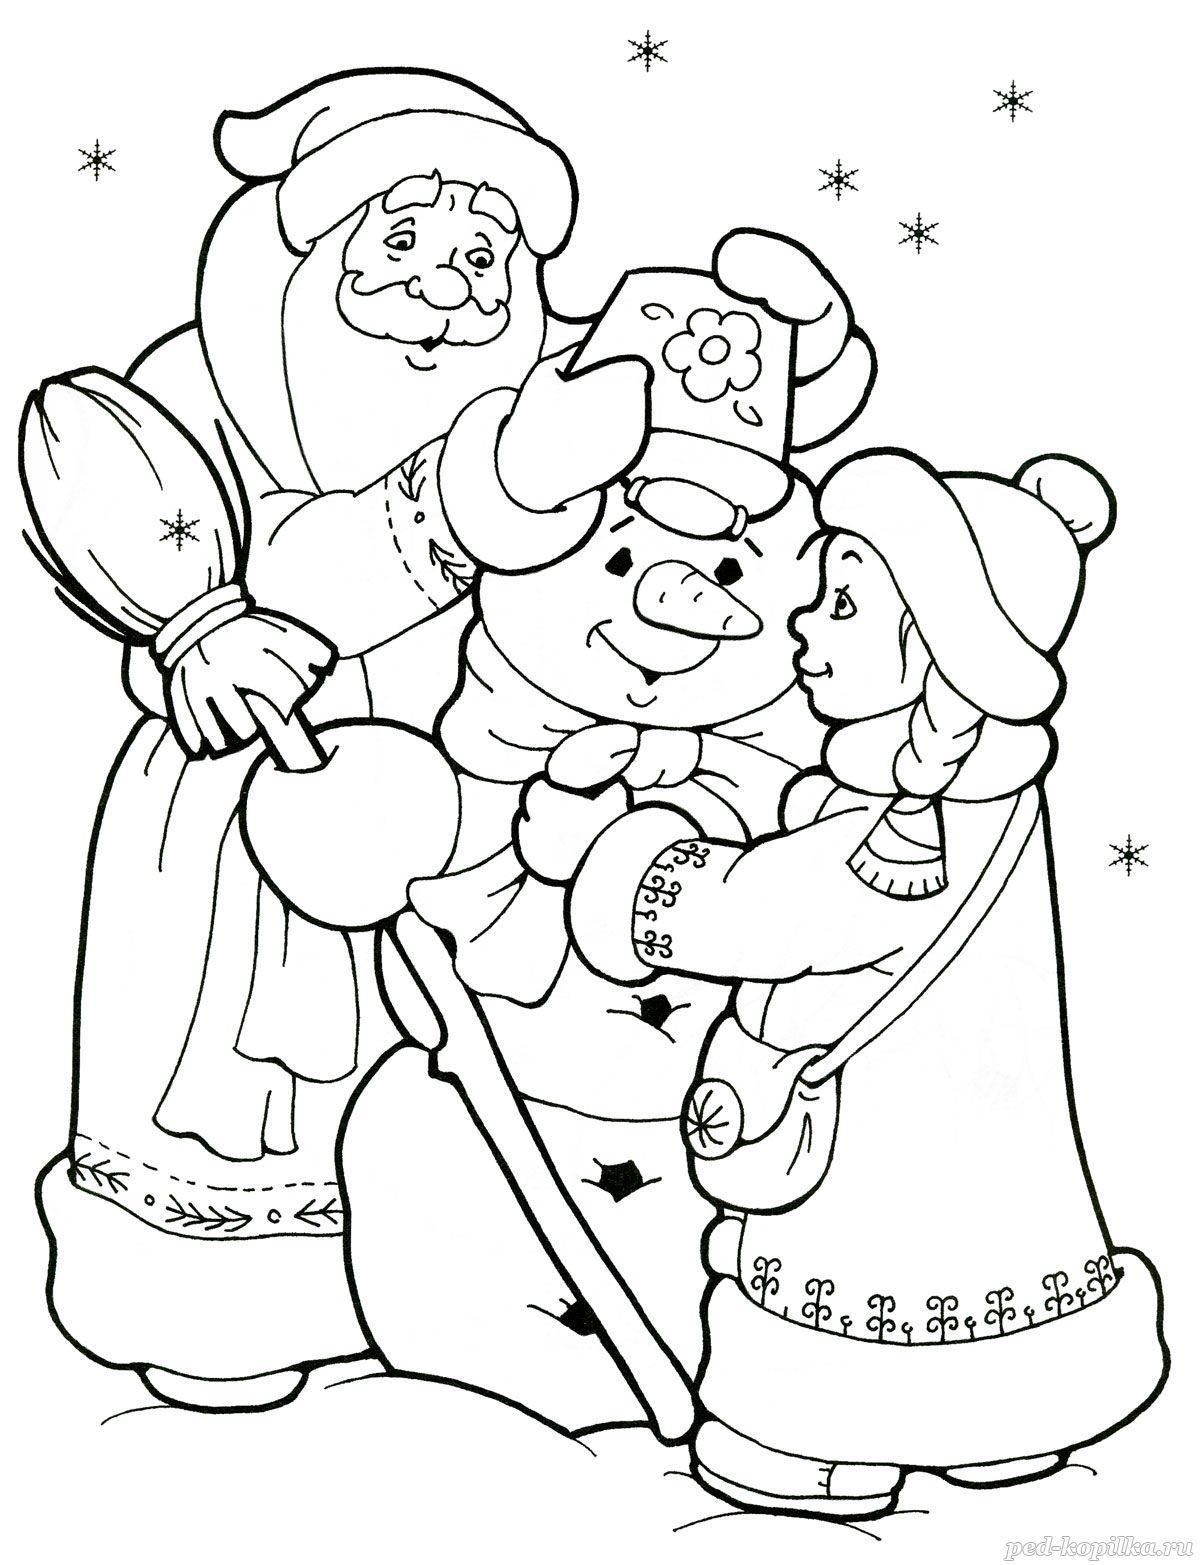 раскраска дед мороз и снеговик